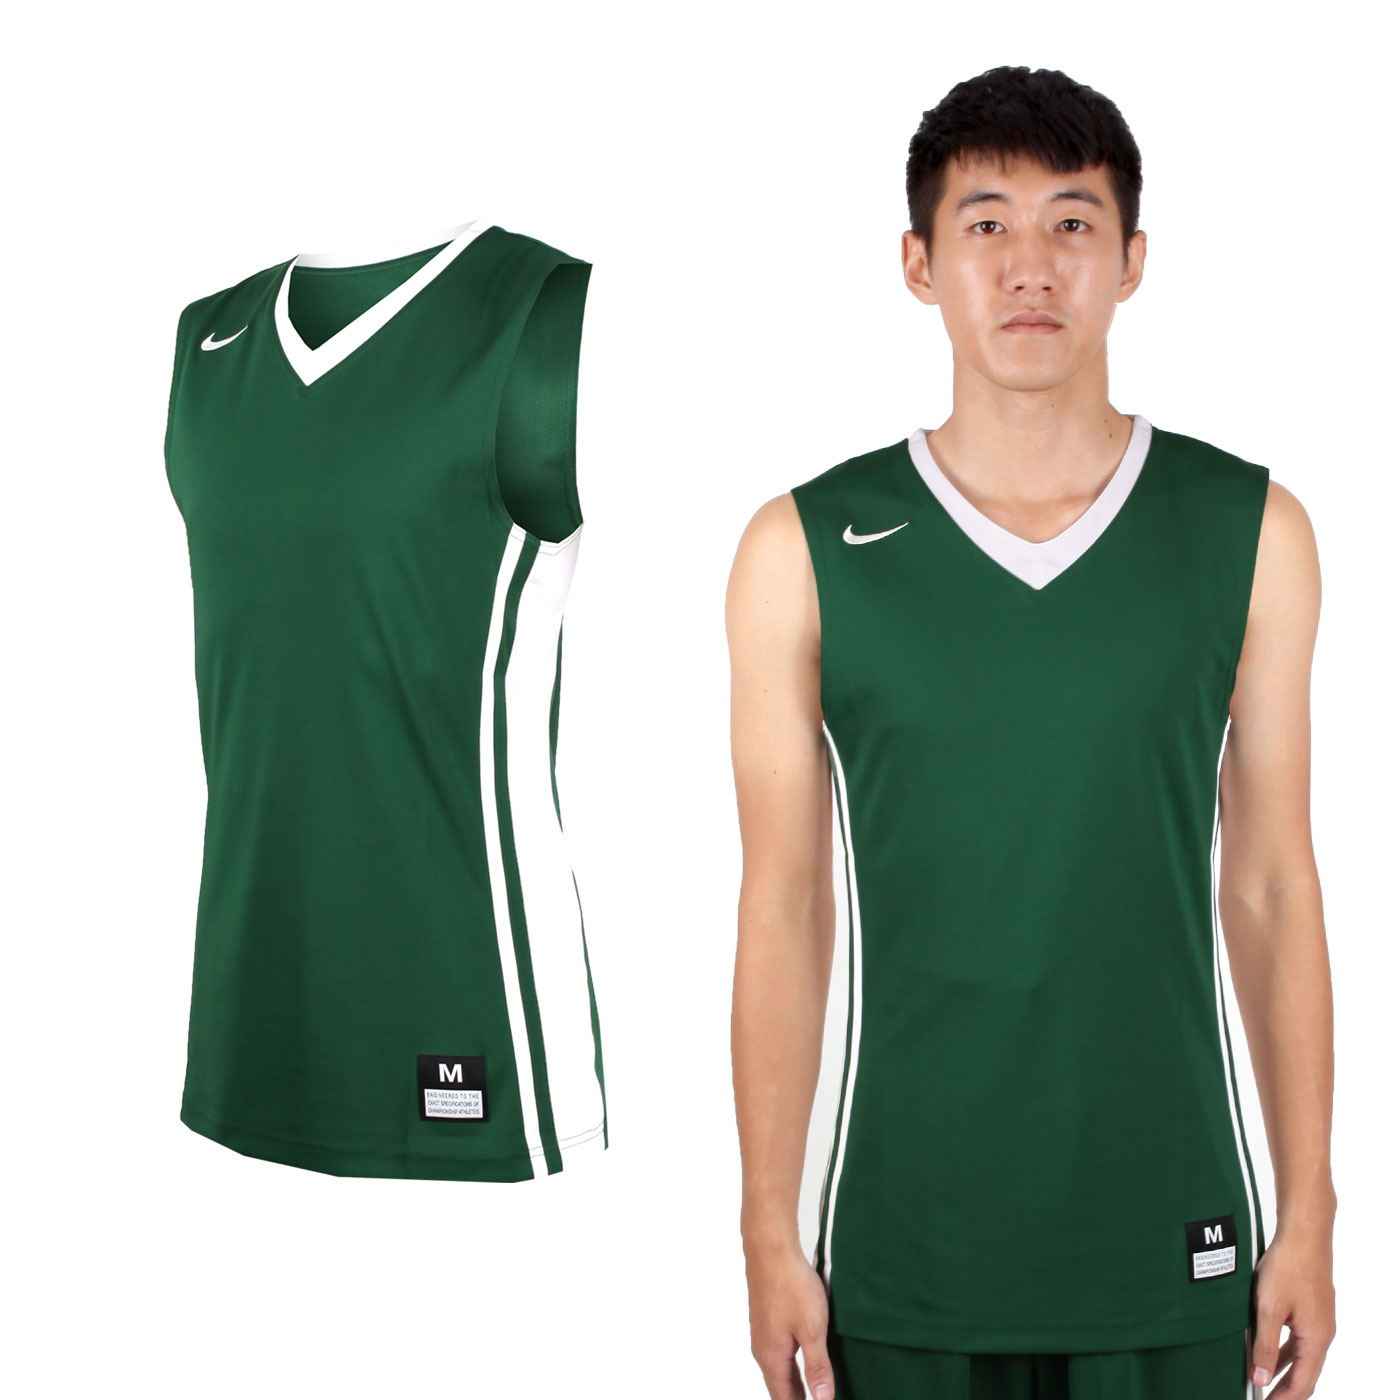 NIKE 男款V領籃球針織背心 639395342 - 綠白